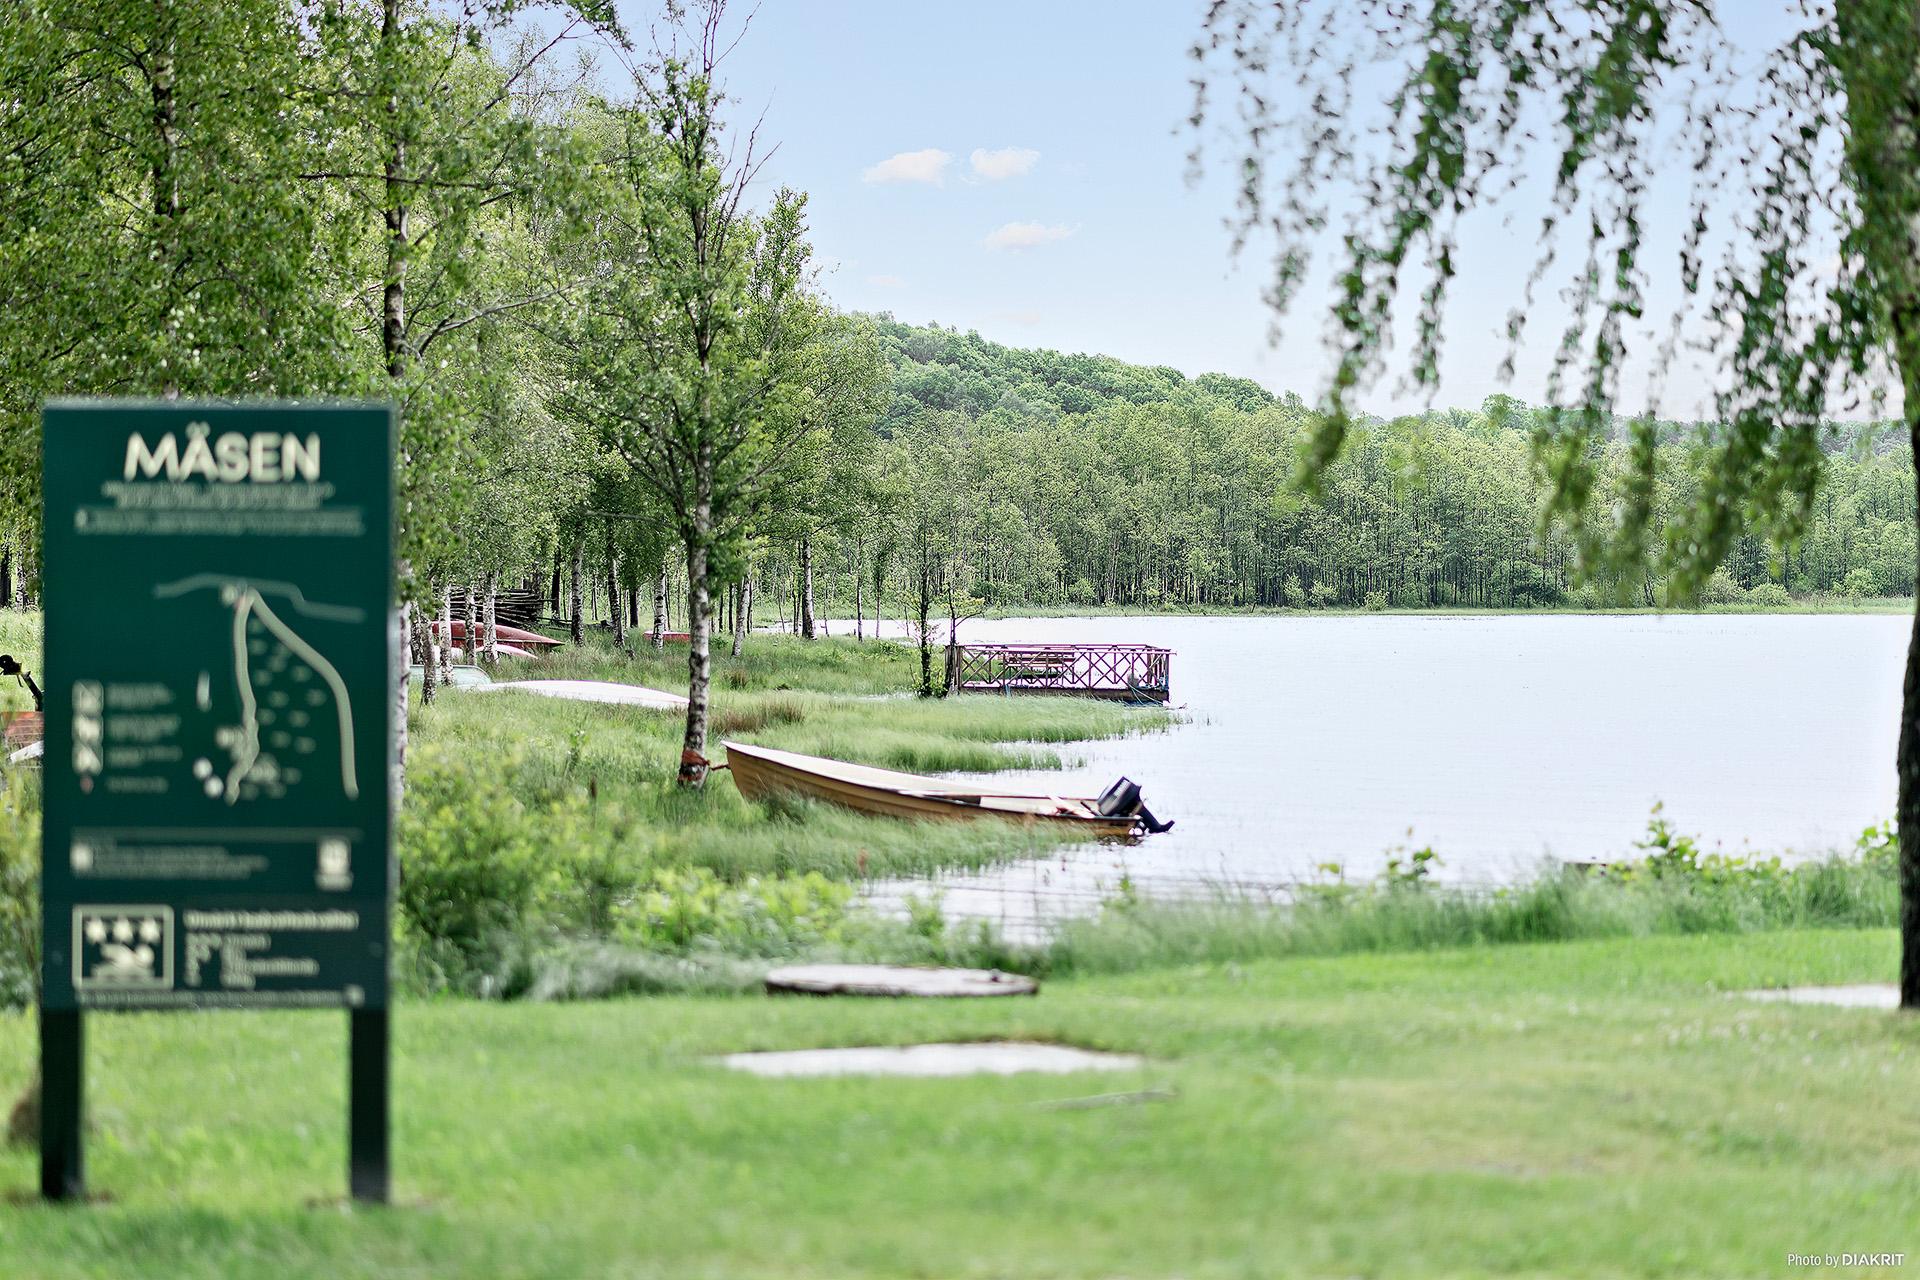 Badplats i närheten utav huset i sjön Mäsen